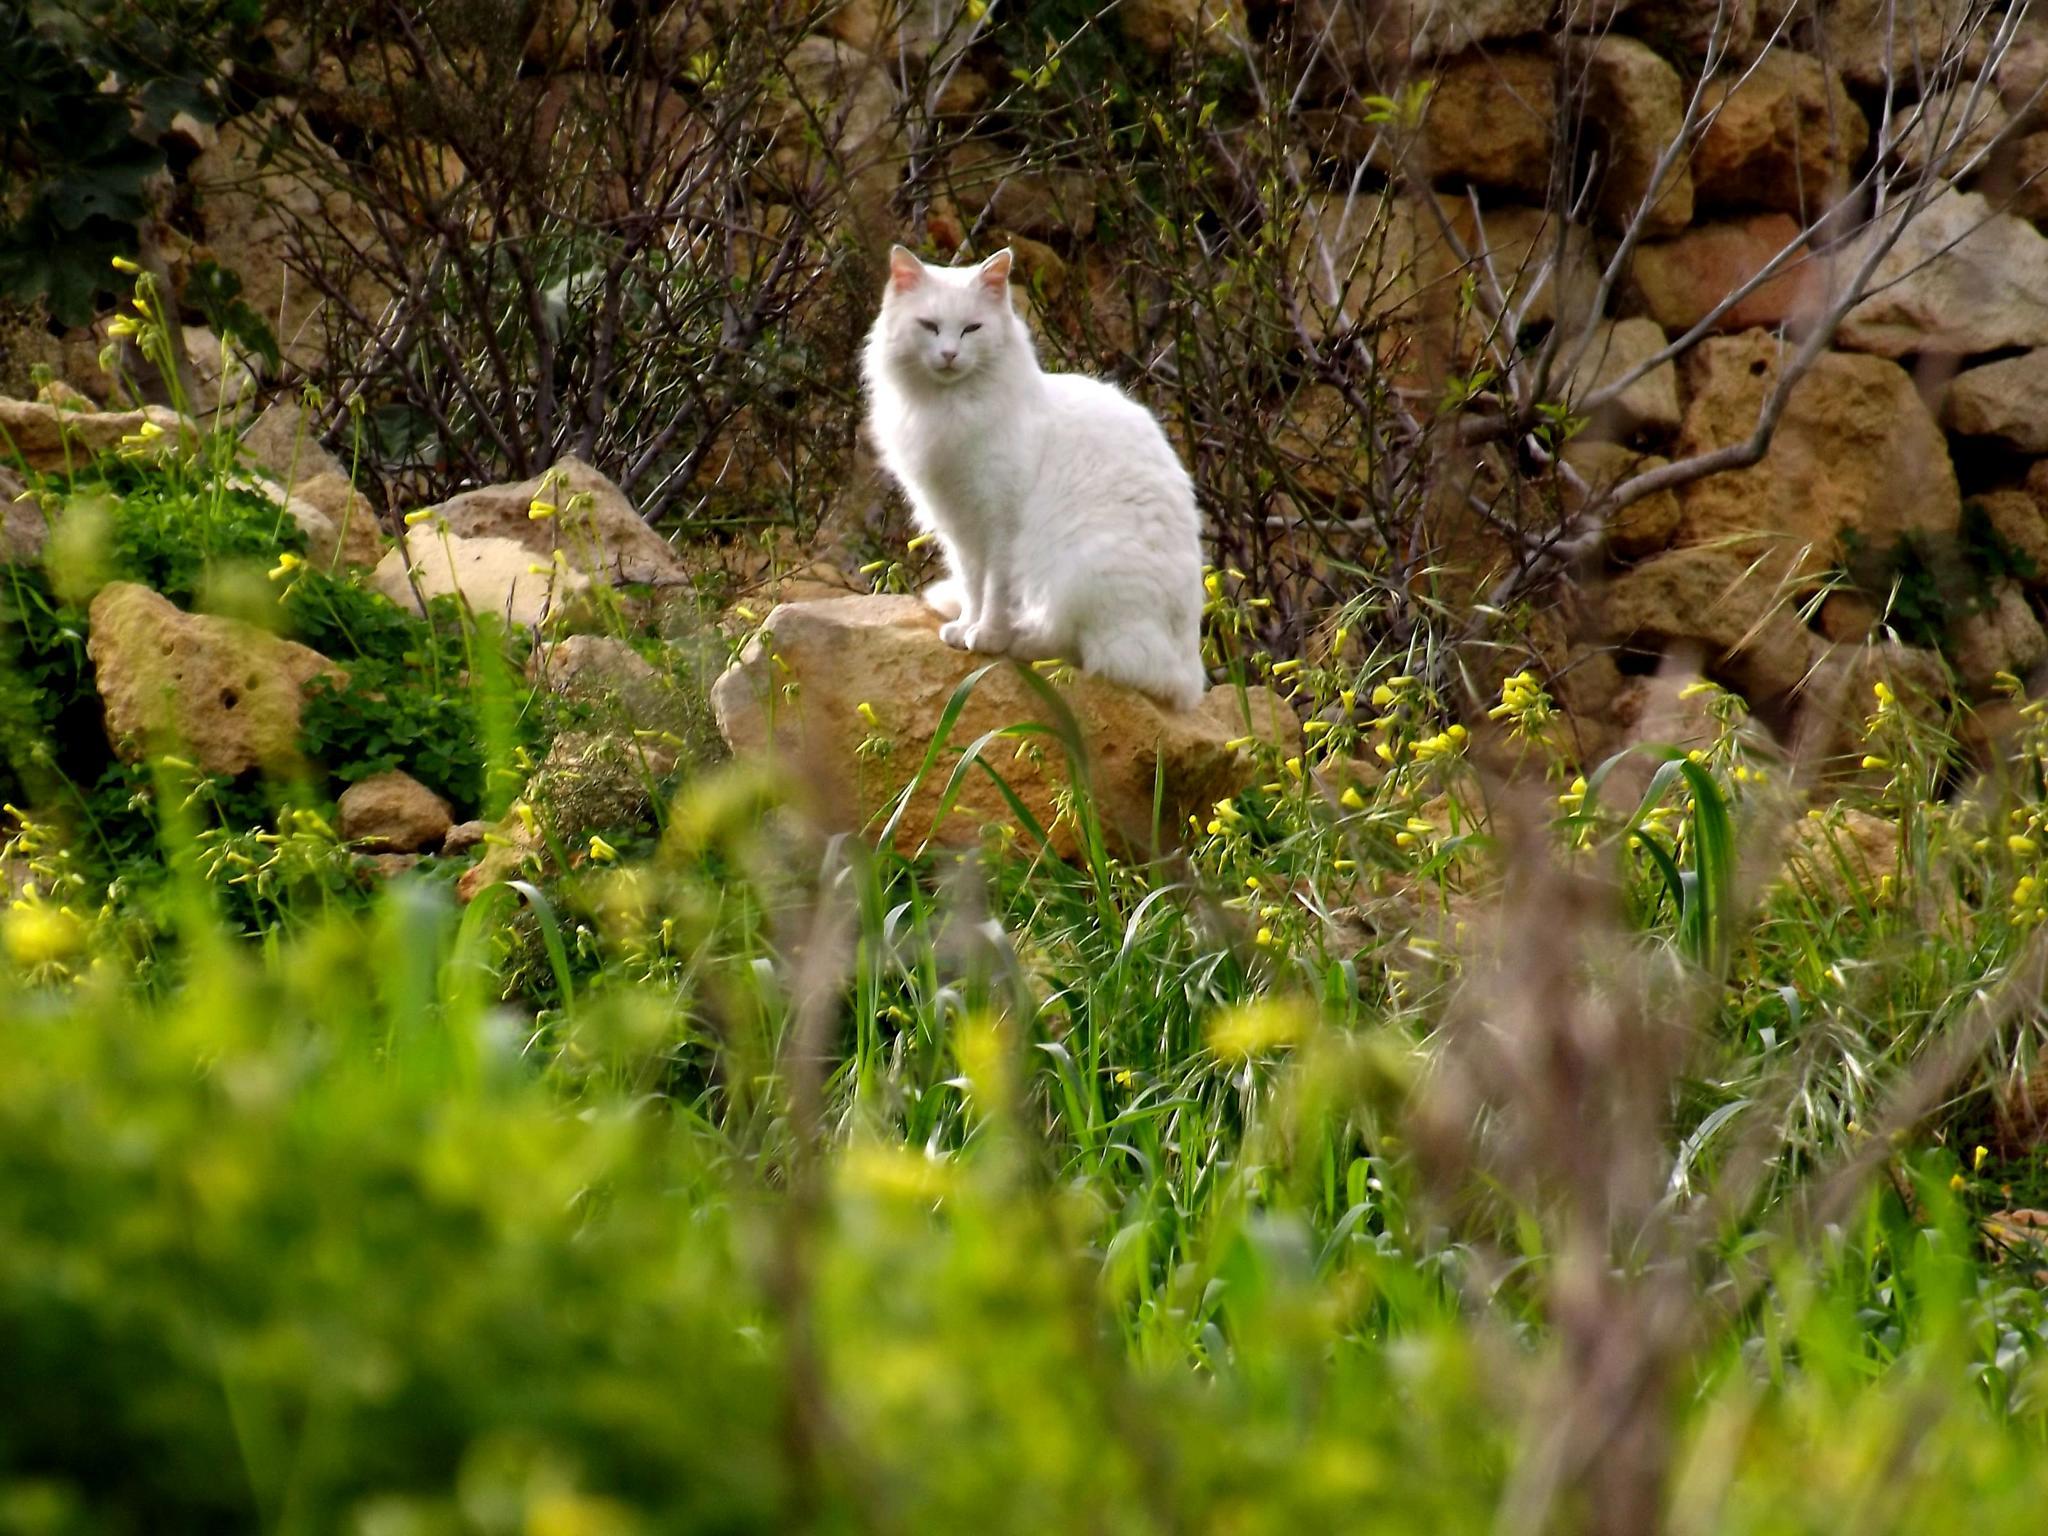 White Cat by Rrapa